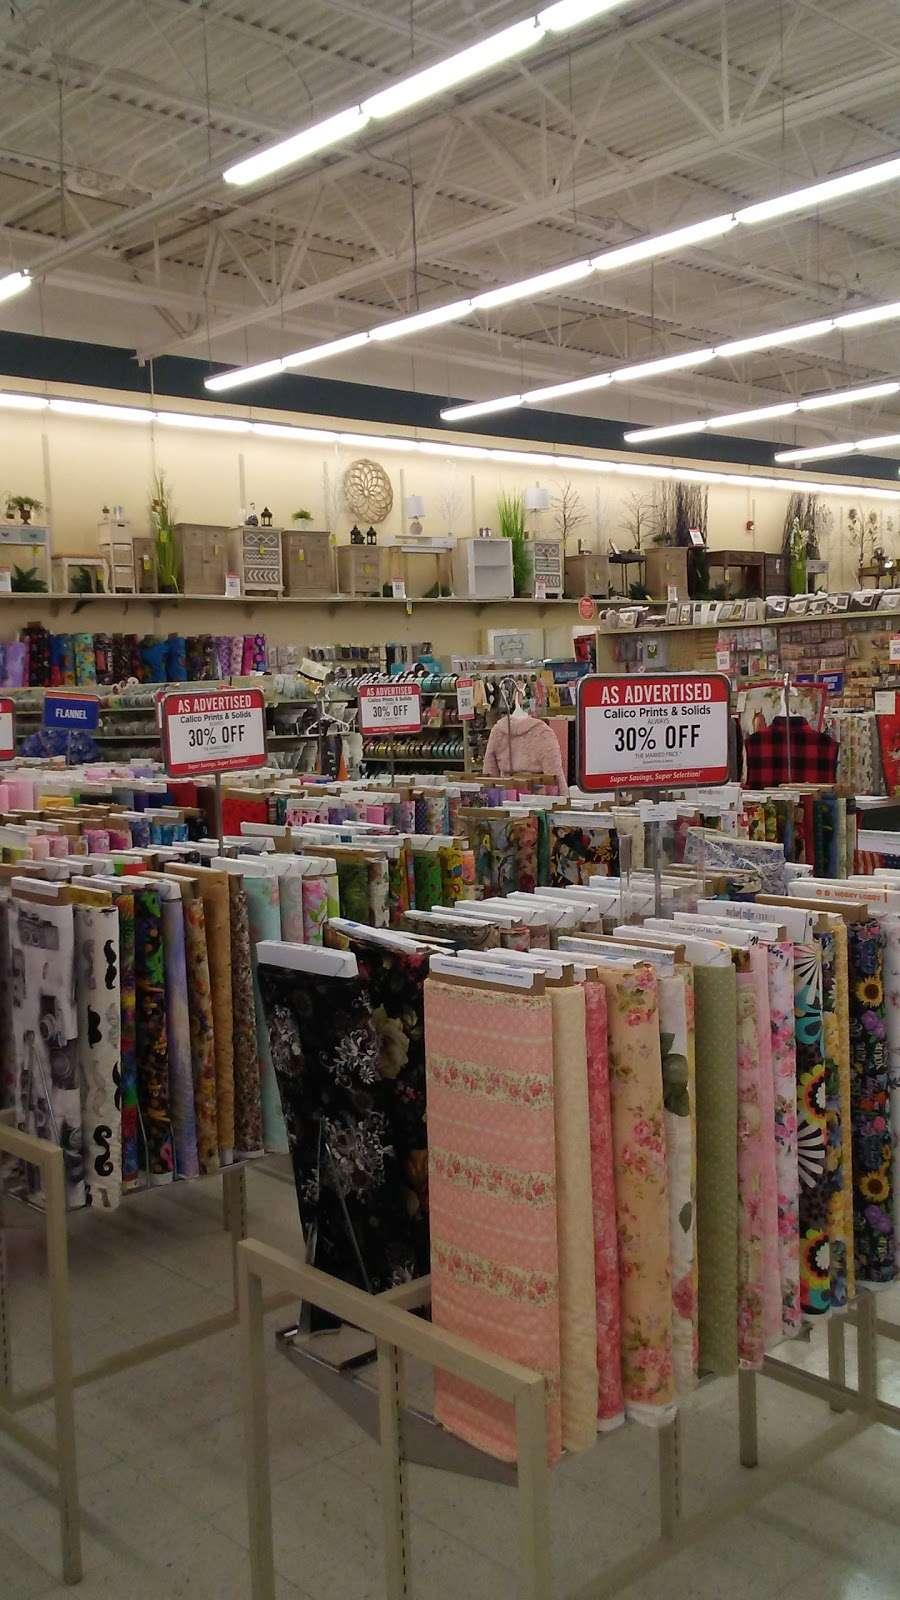 Hobby Lobby - home goods store  | Photo 9 of 10 | Address: 10575 E Washington St, Indianapolis, IN 46229, USA | Phone: (317) 897-1825